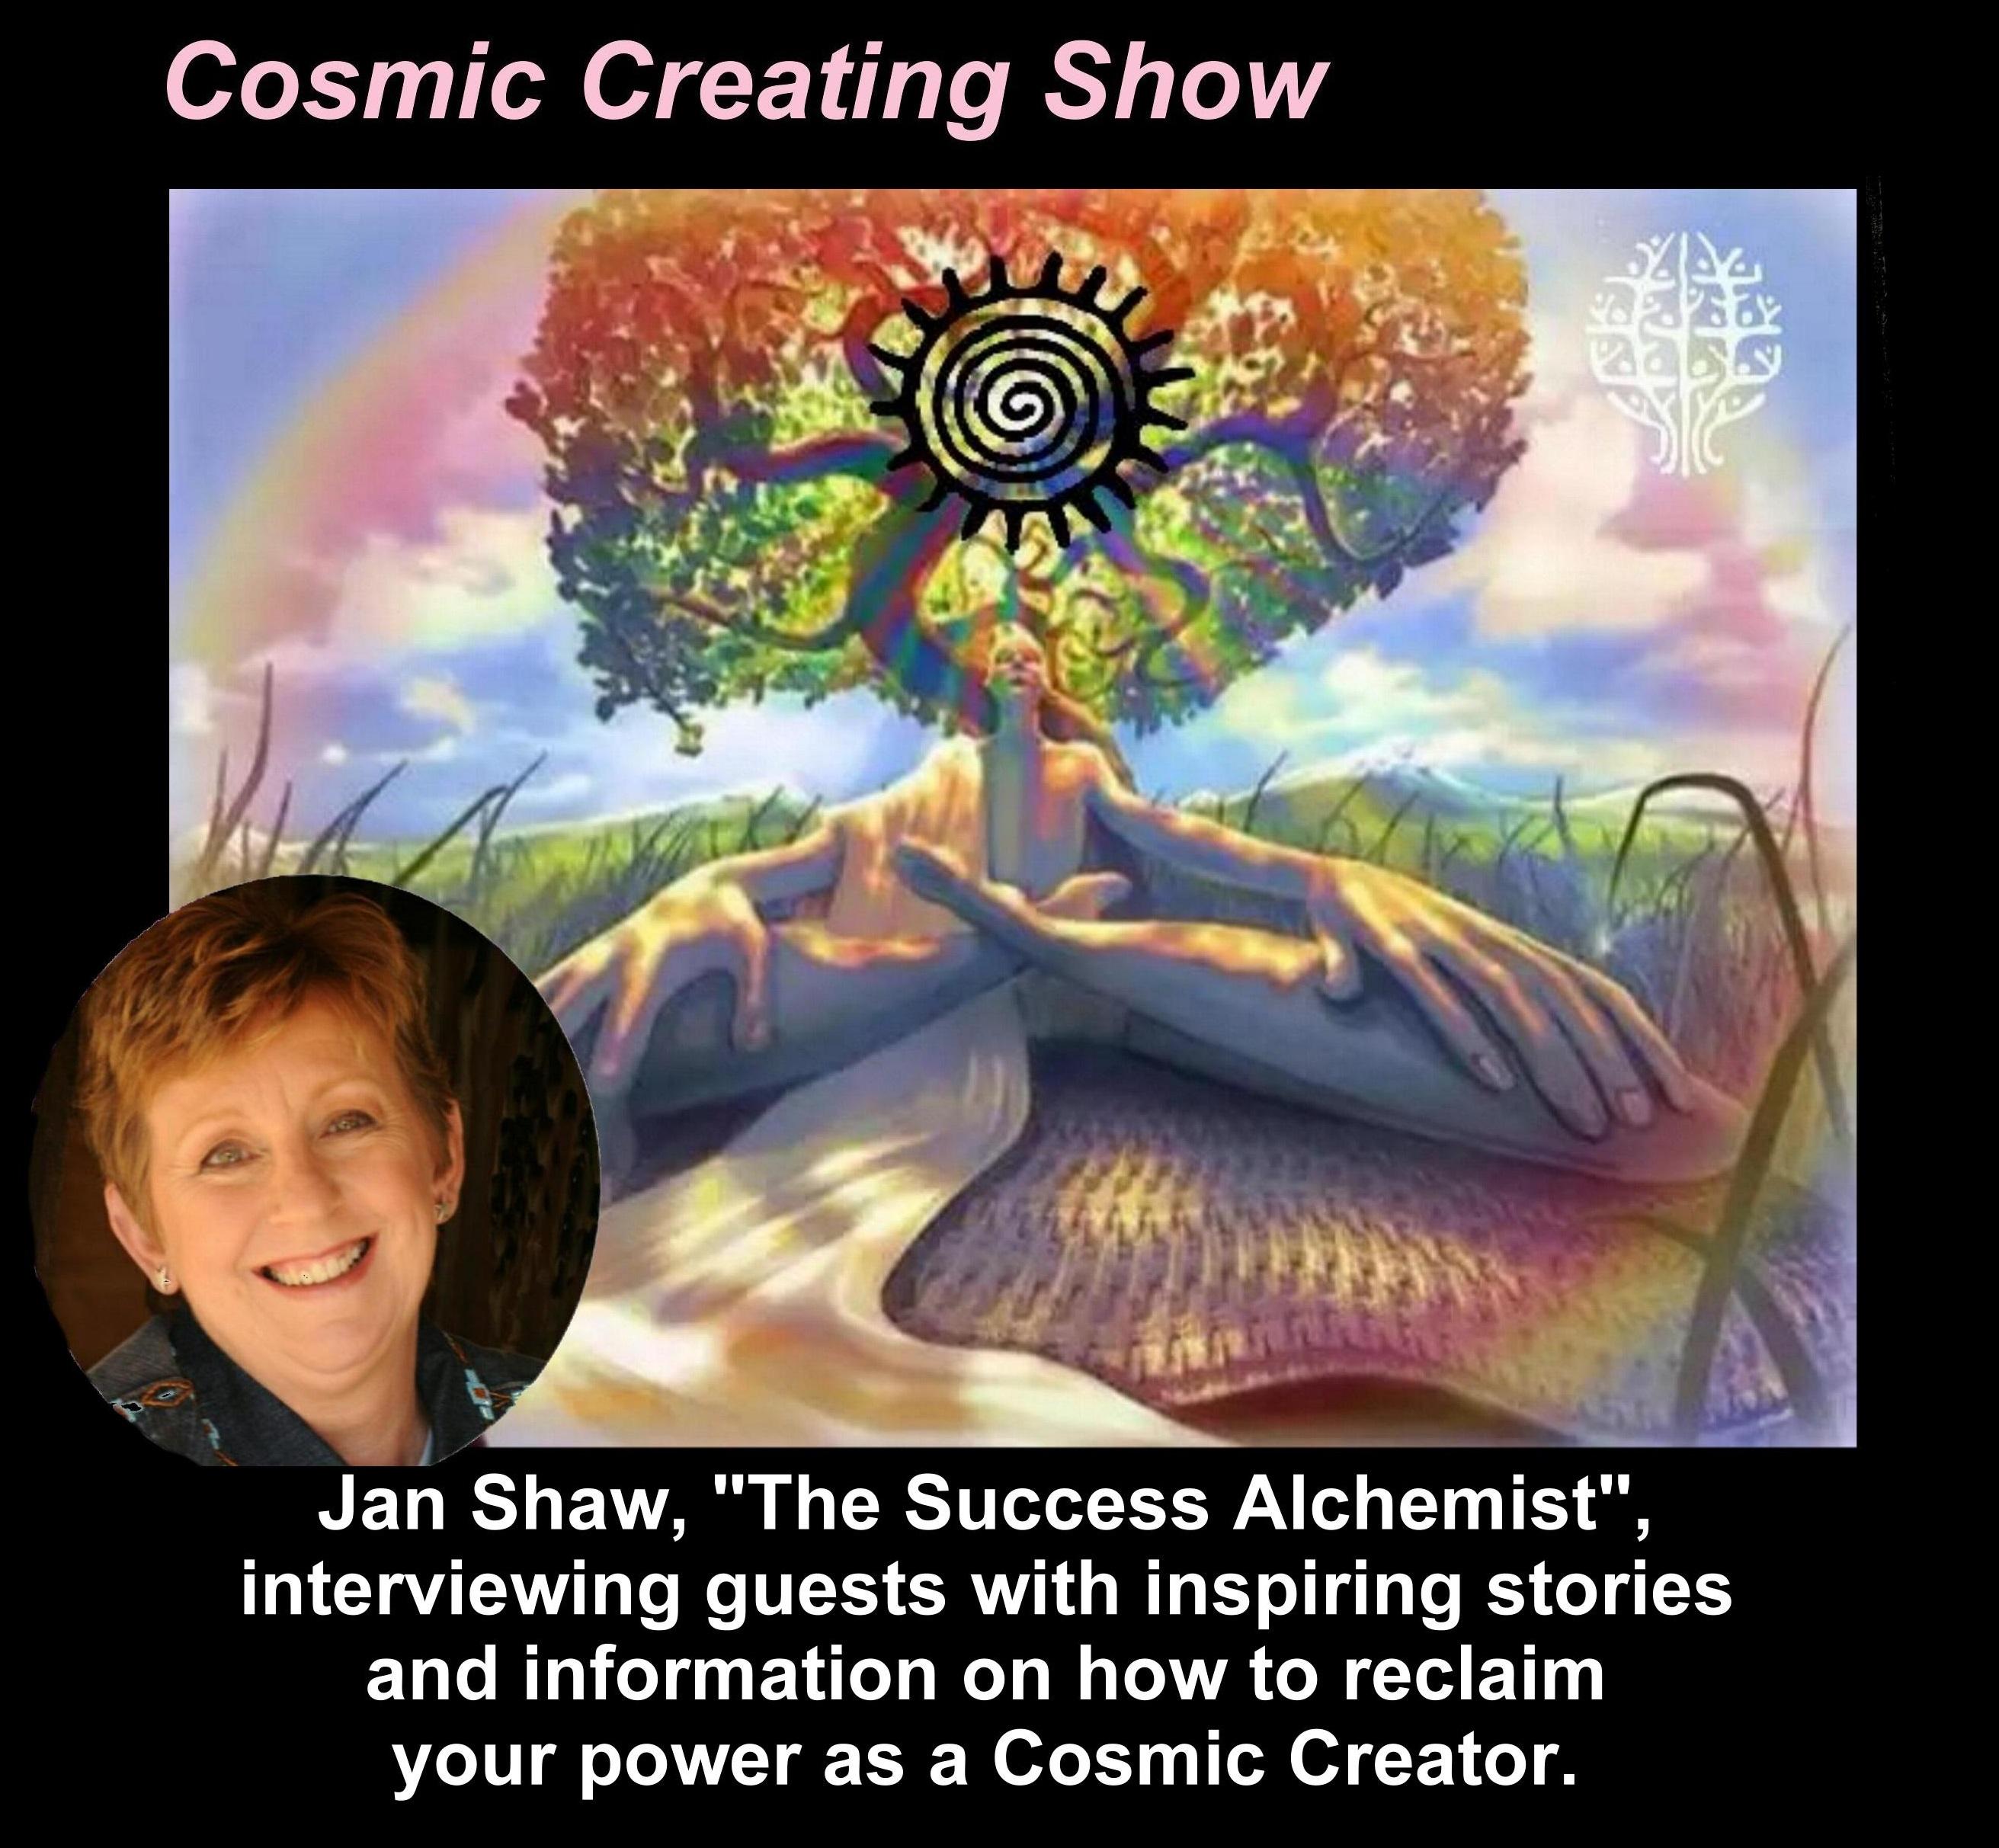 Cosmic Creating Show